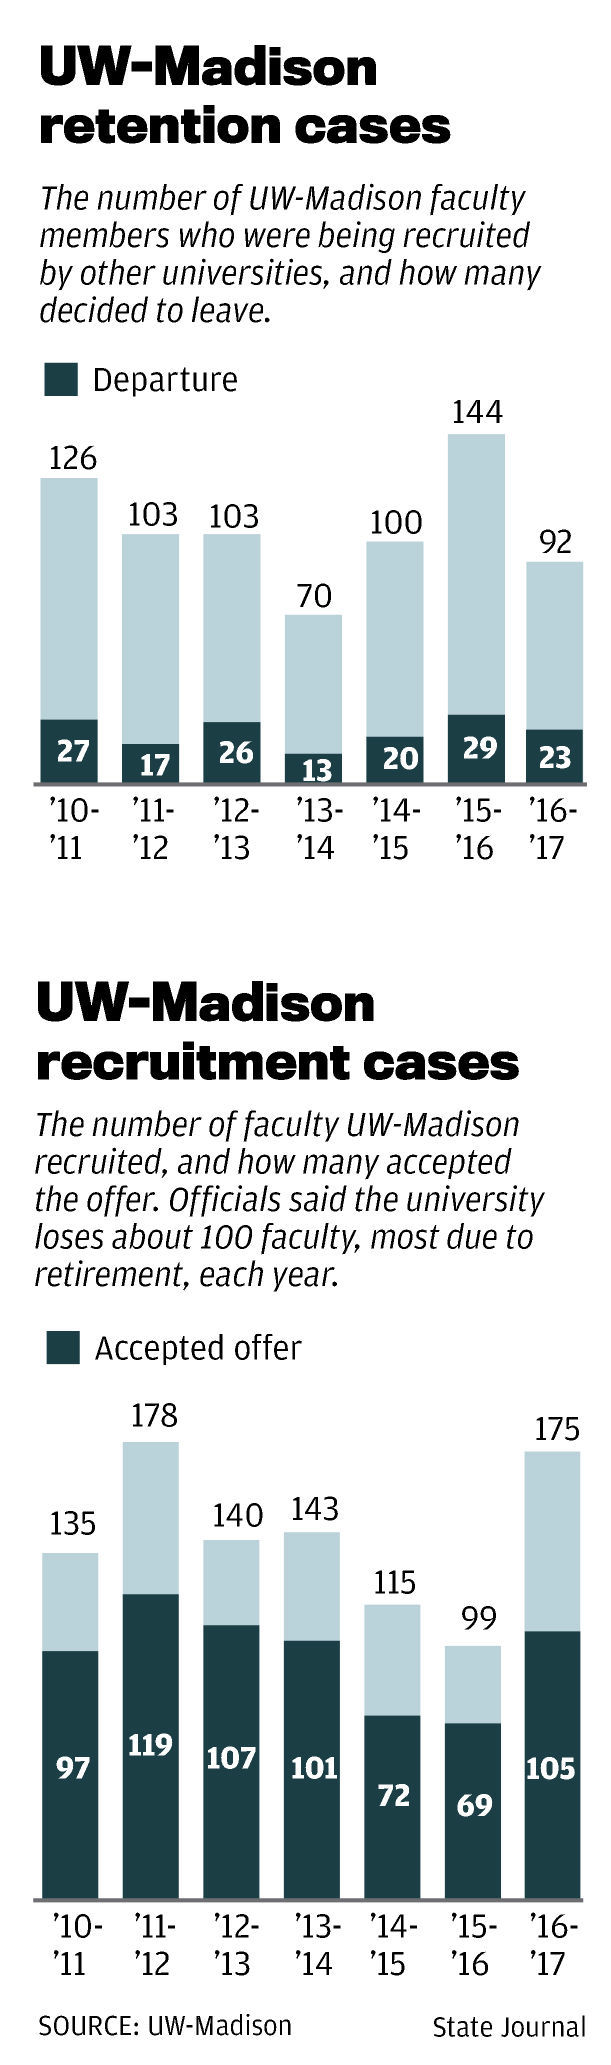 UW-Madison retention and recruitment cases